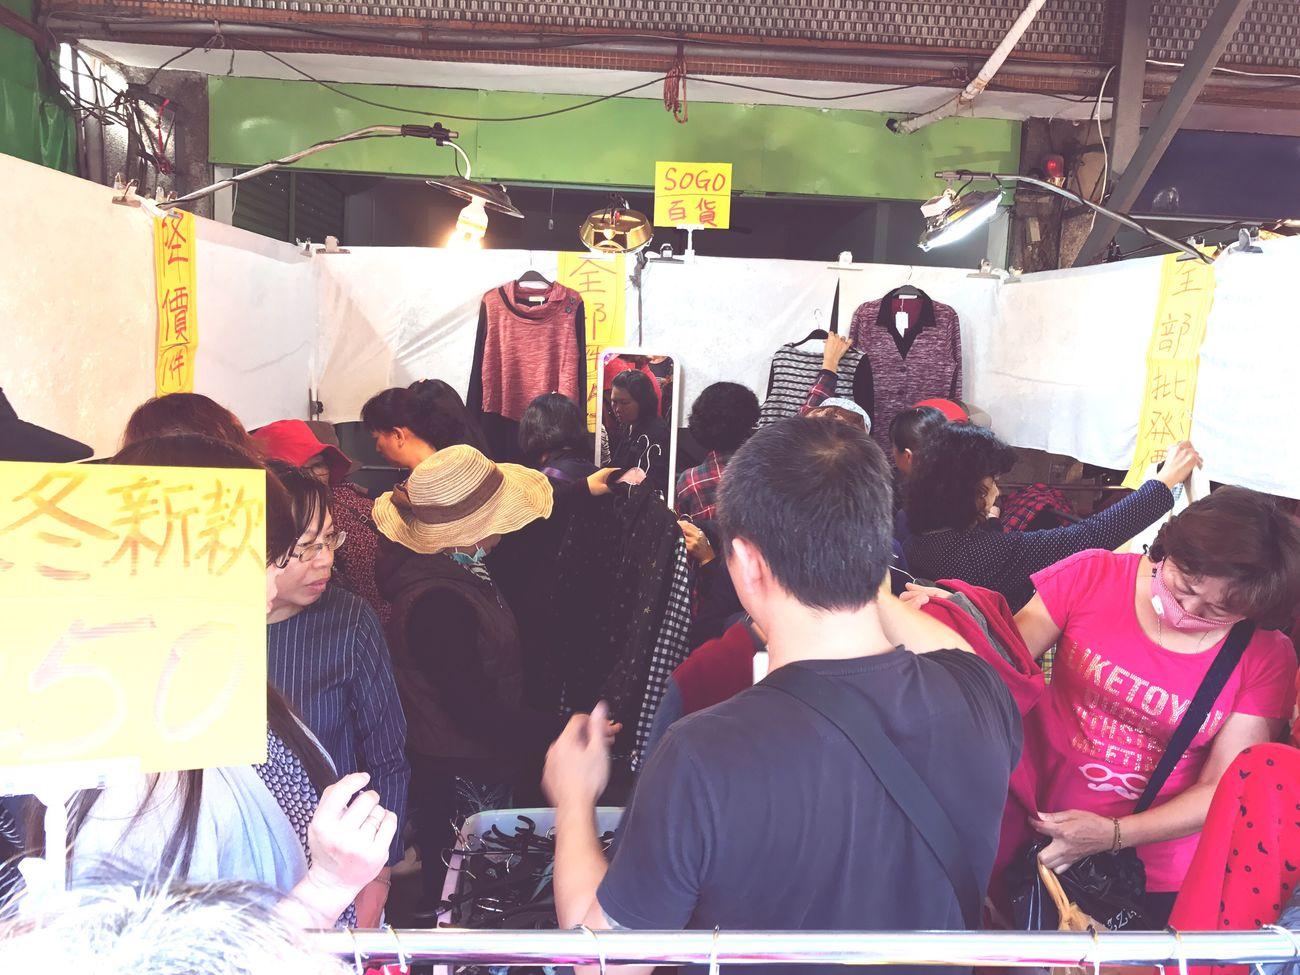 挖到寶,難怪人家可以去大溪地 Clothes Sale Laborer People Inexpensive